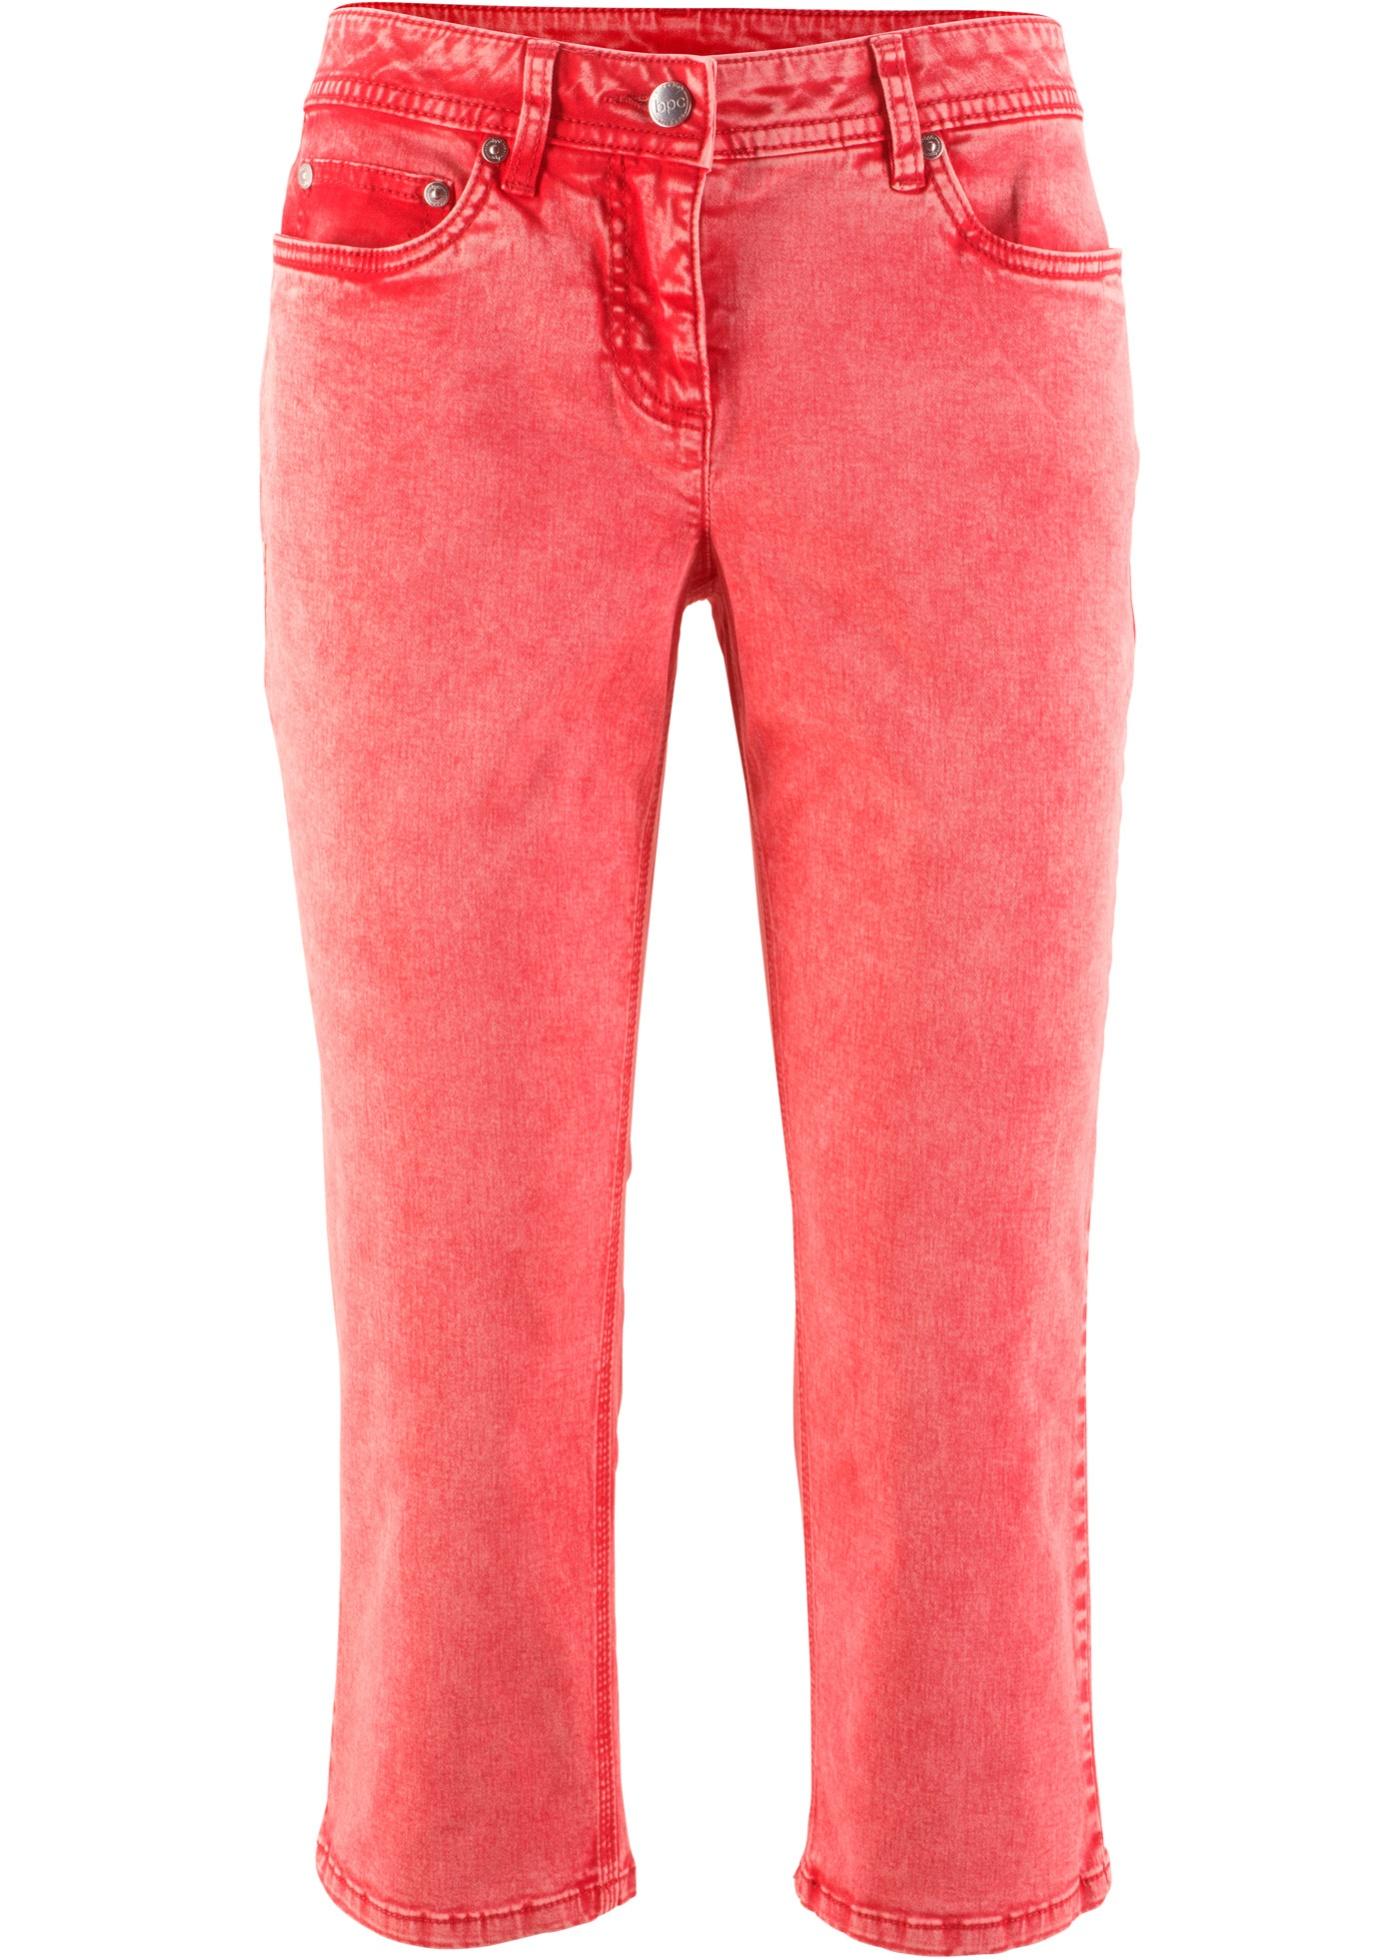 Pantalon extensible 3/4 avec lycra